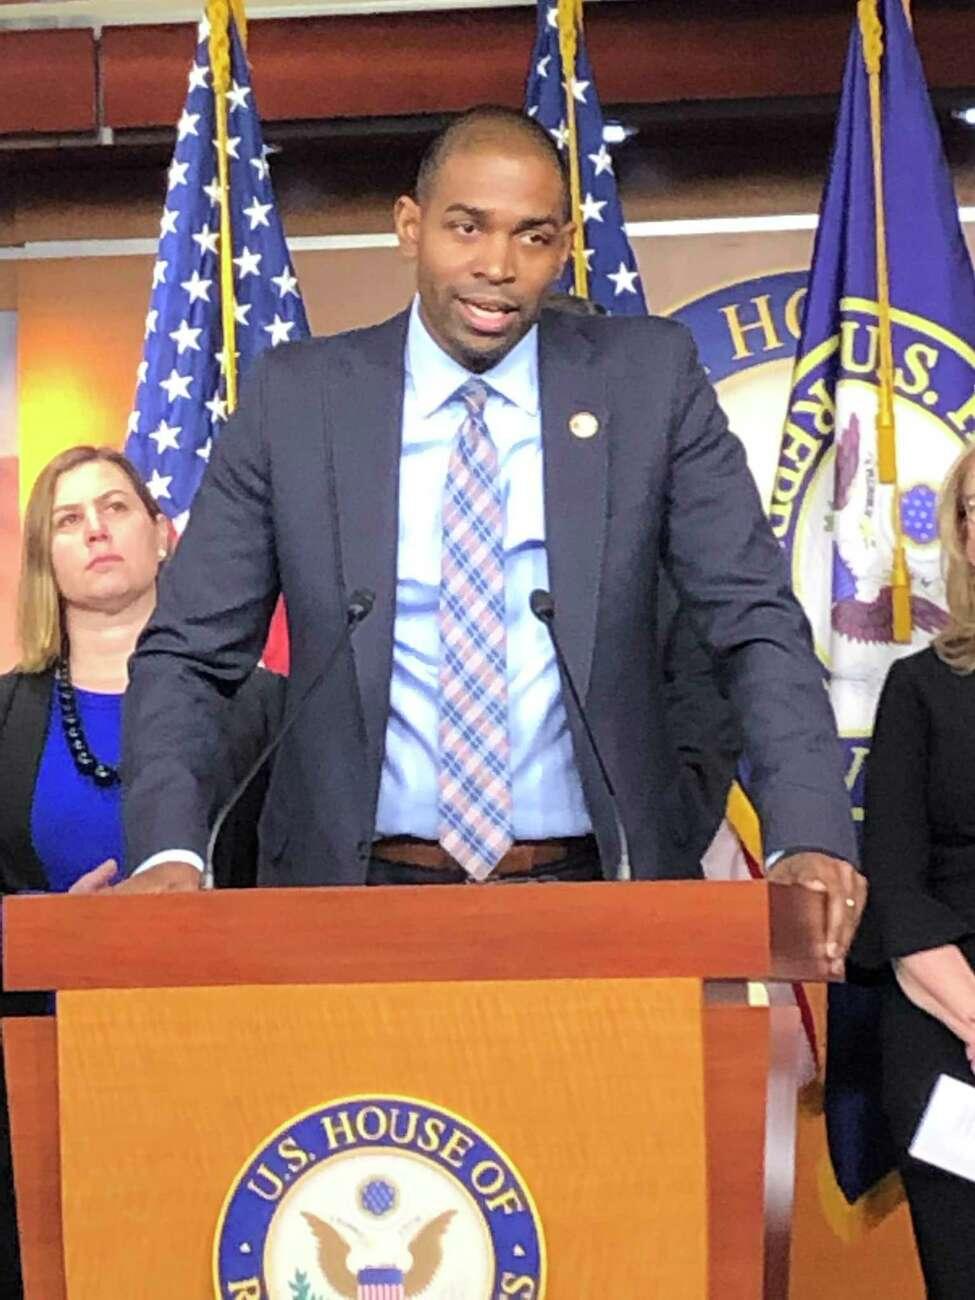 U.S. Rep. Antonio Delgado, D-Rhinebeck, speaks at a Jan. 23, 2019, news conference in Washington, D.C.